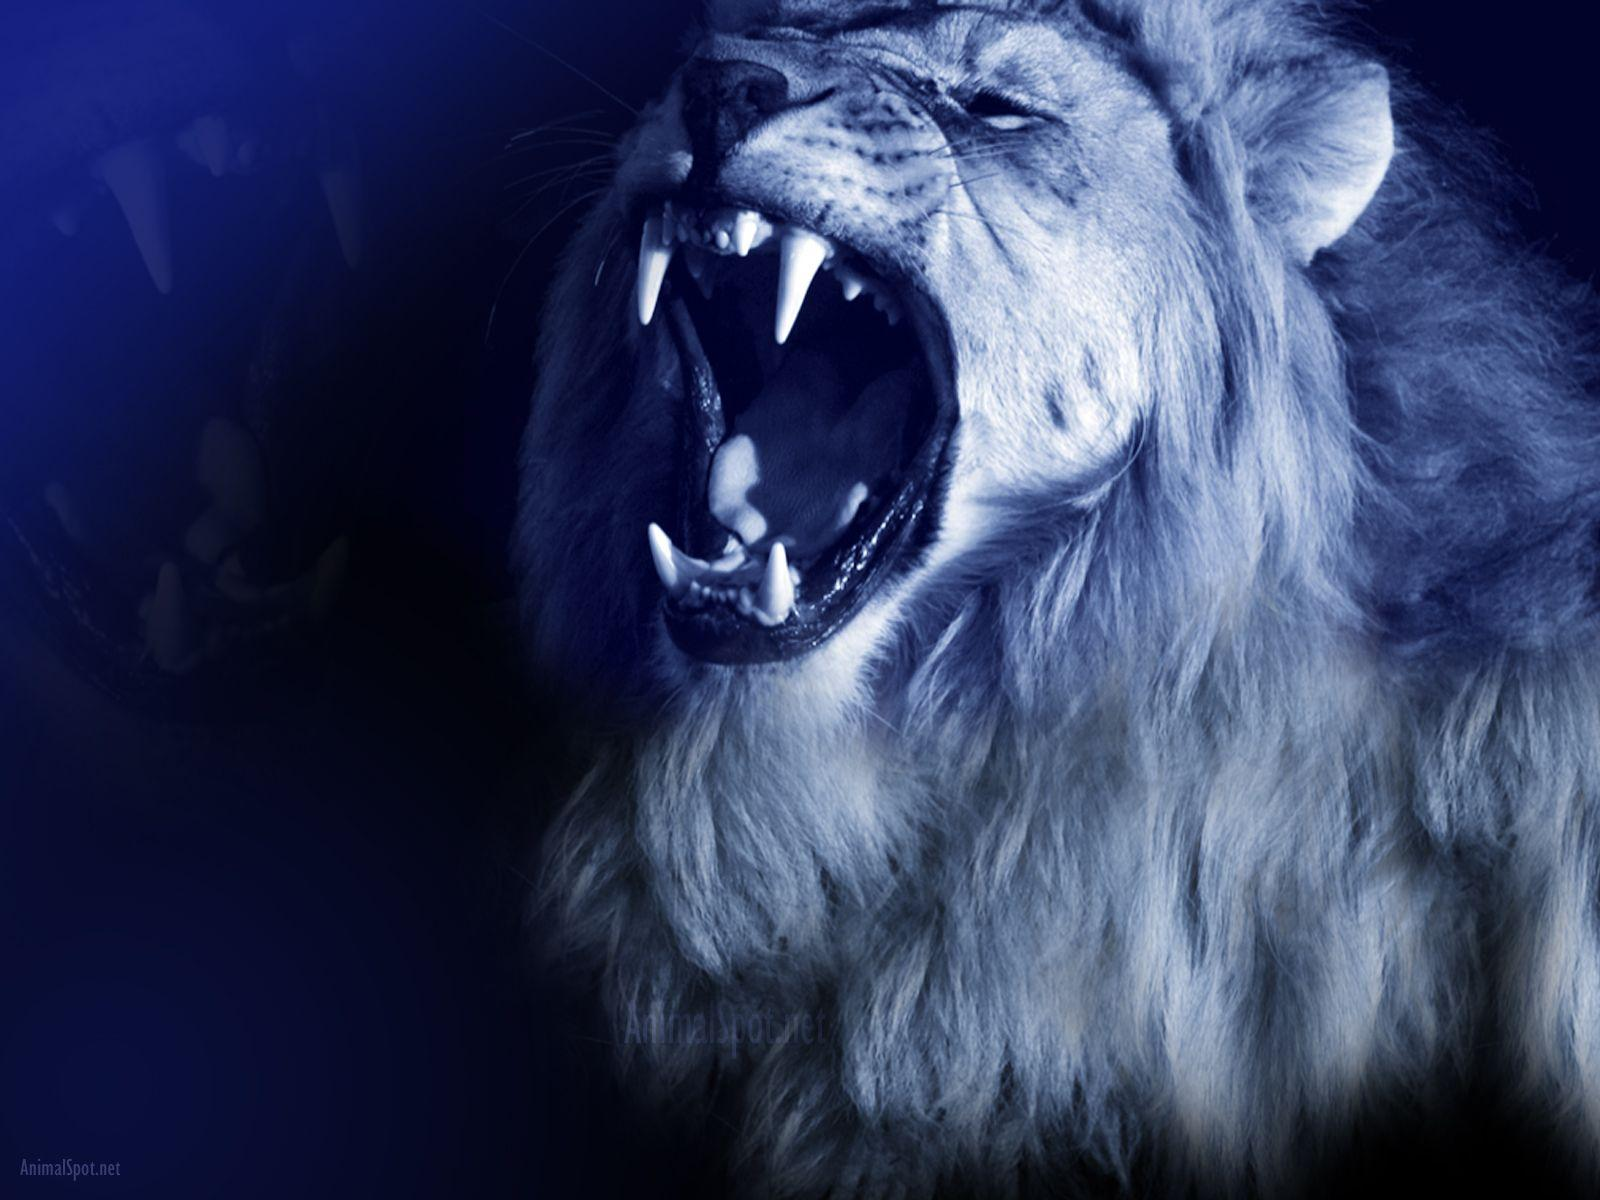 Lion Roar Wallpapers - Wallpaper Cave - photo#3